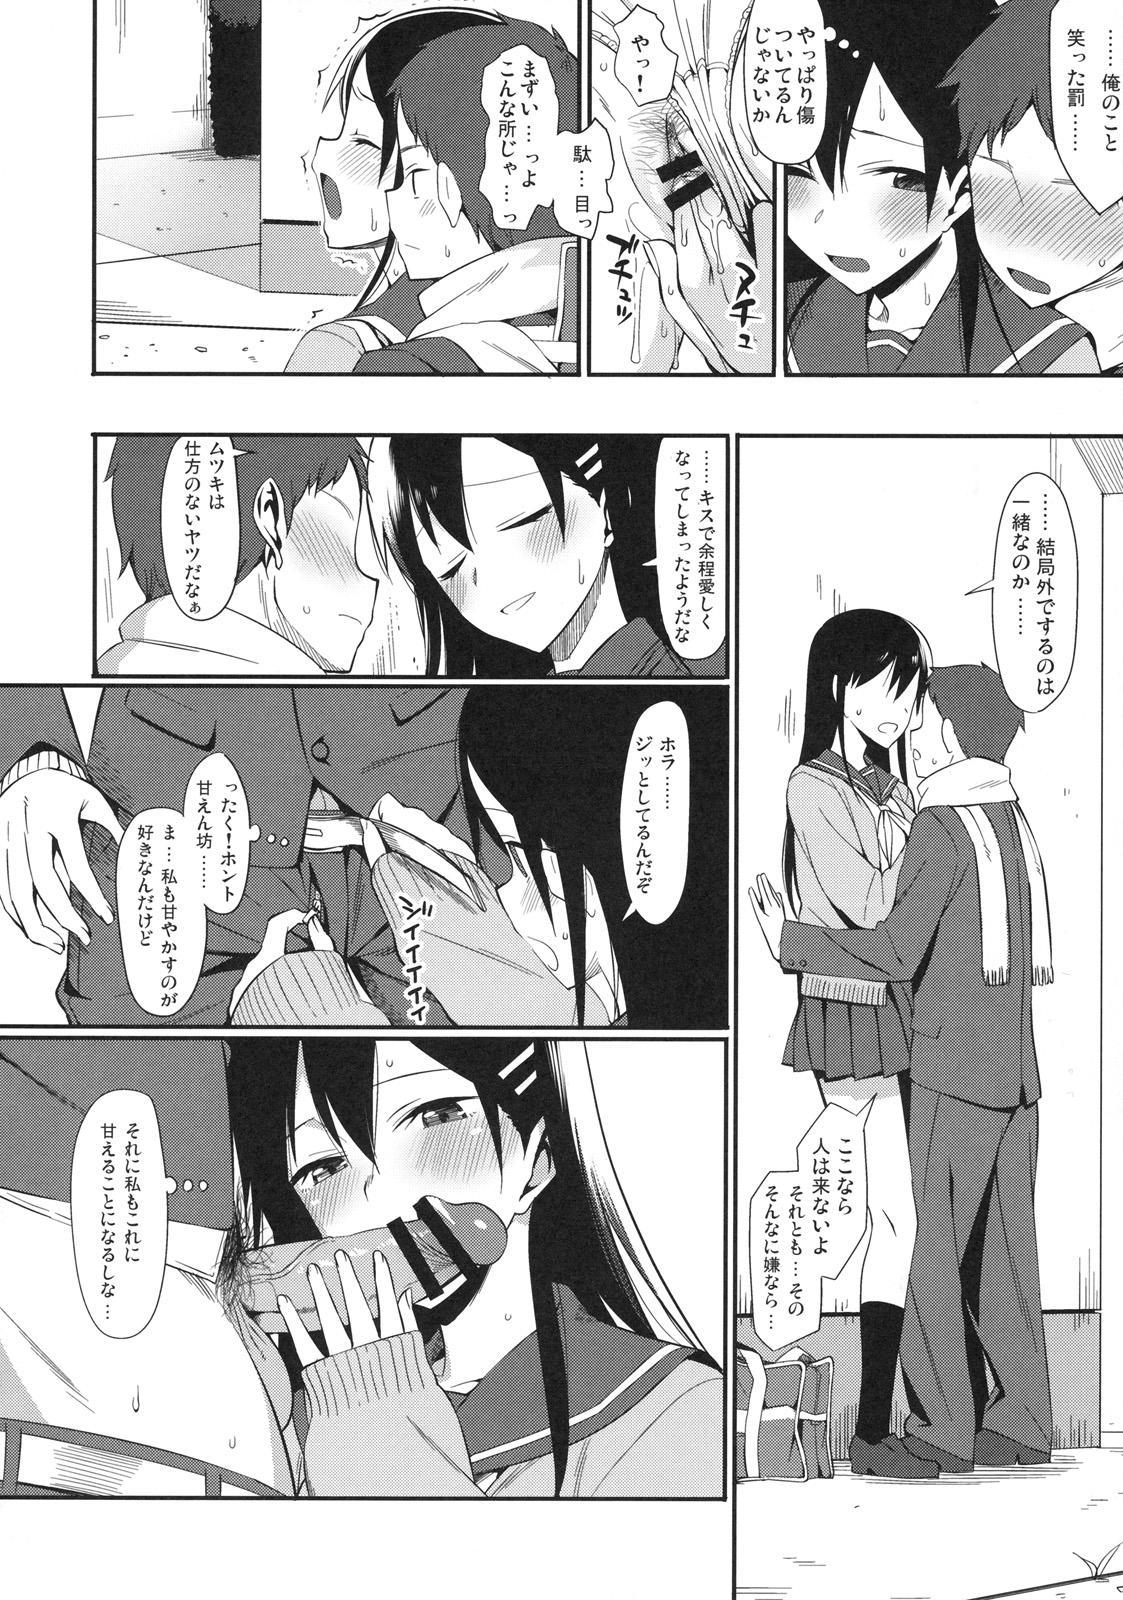 Shinzui Valentine Special Vol. 1 88